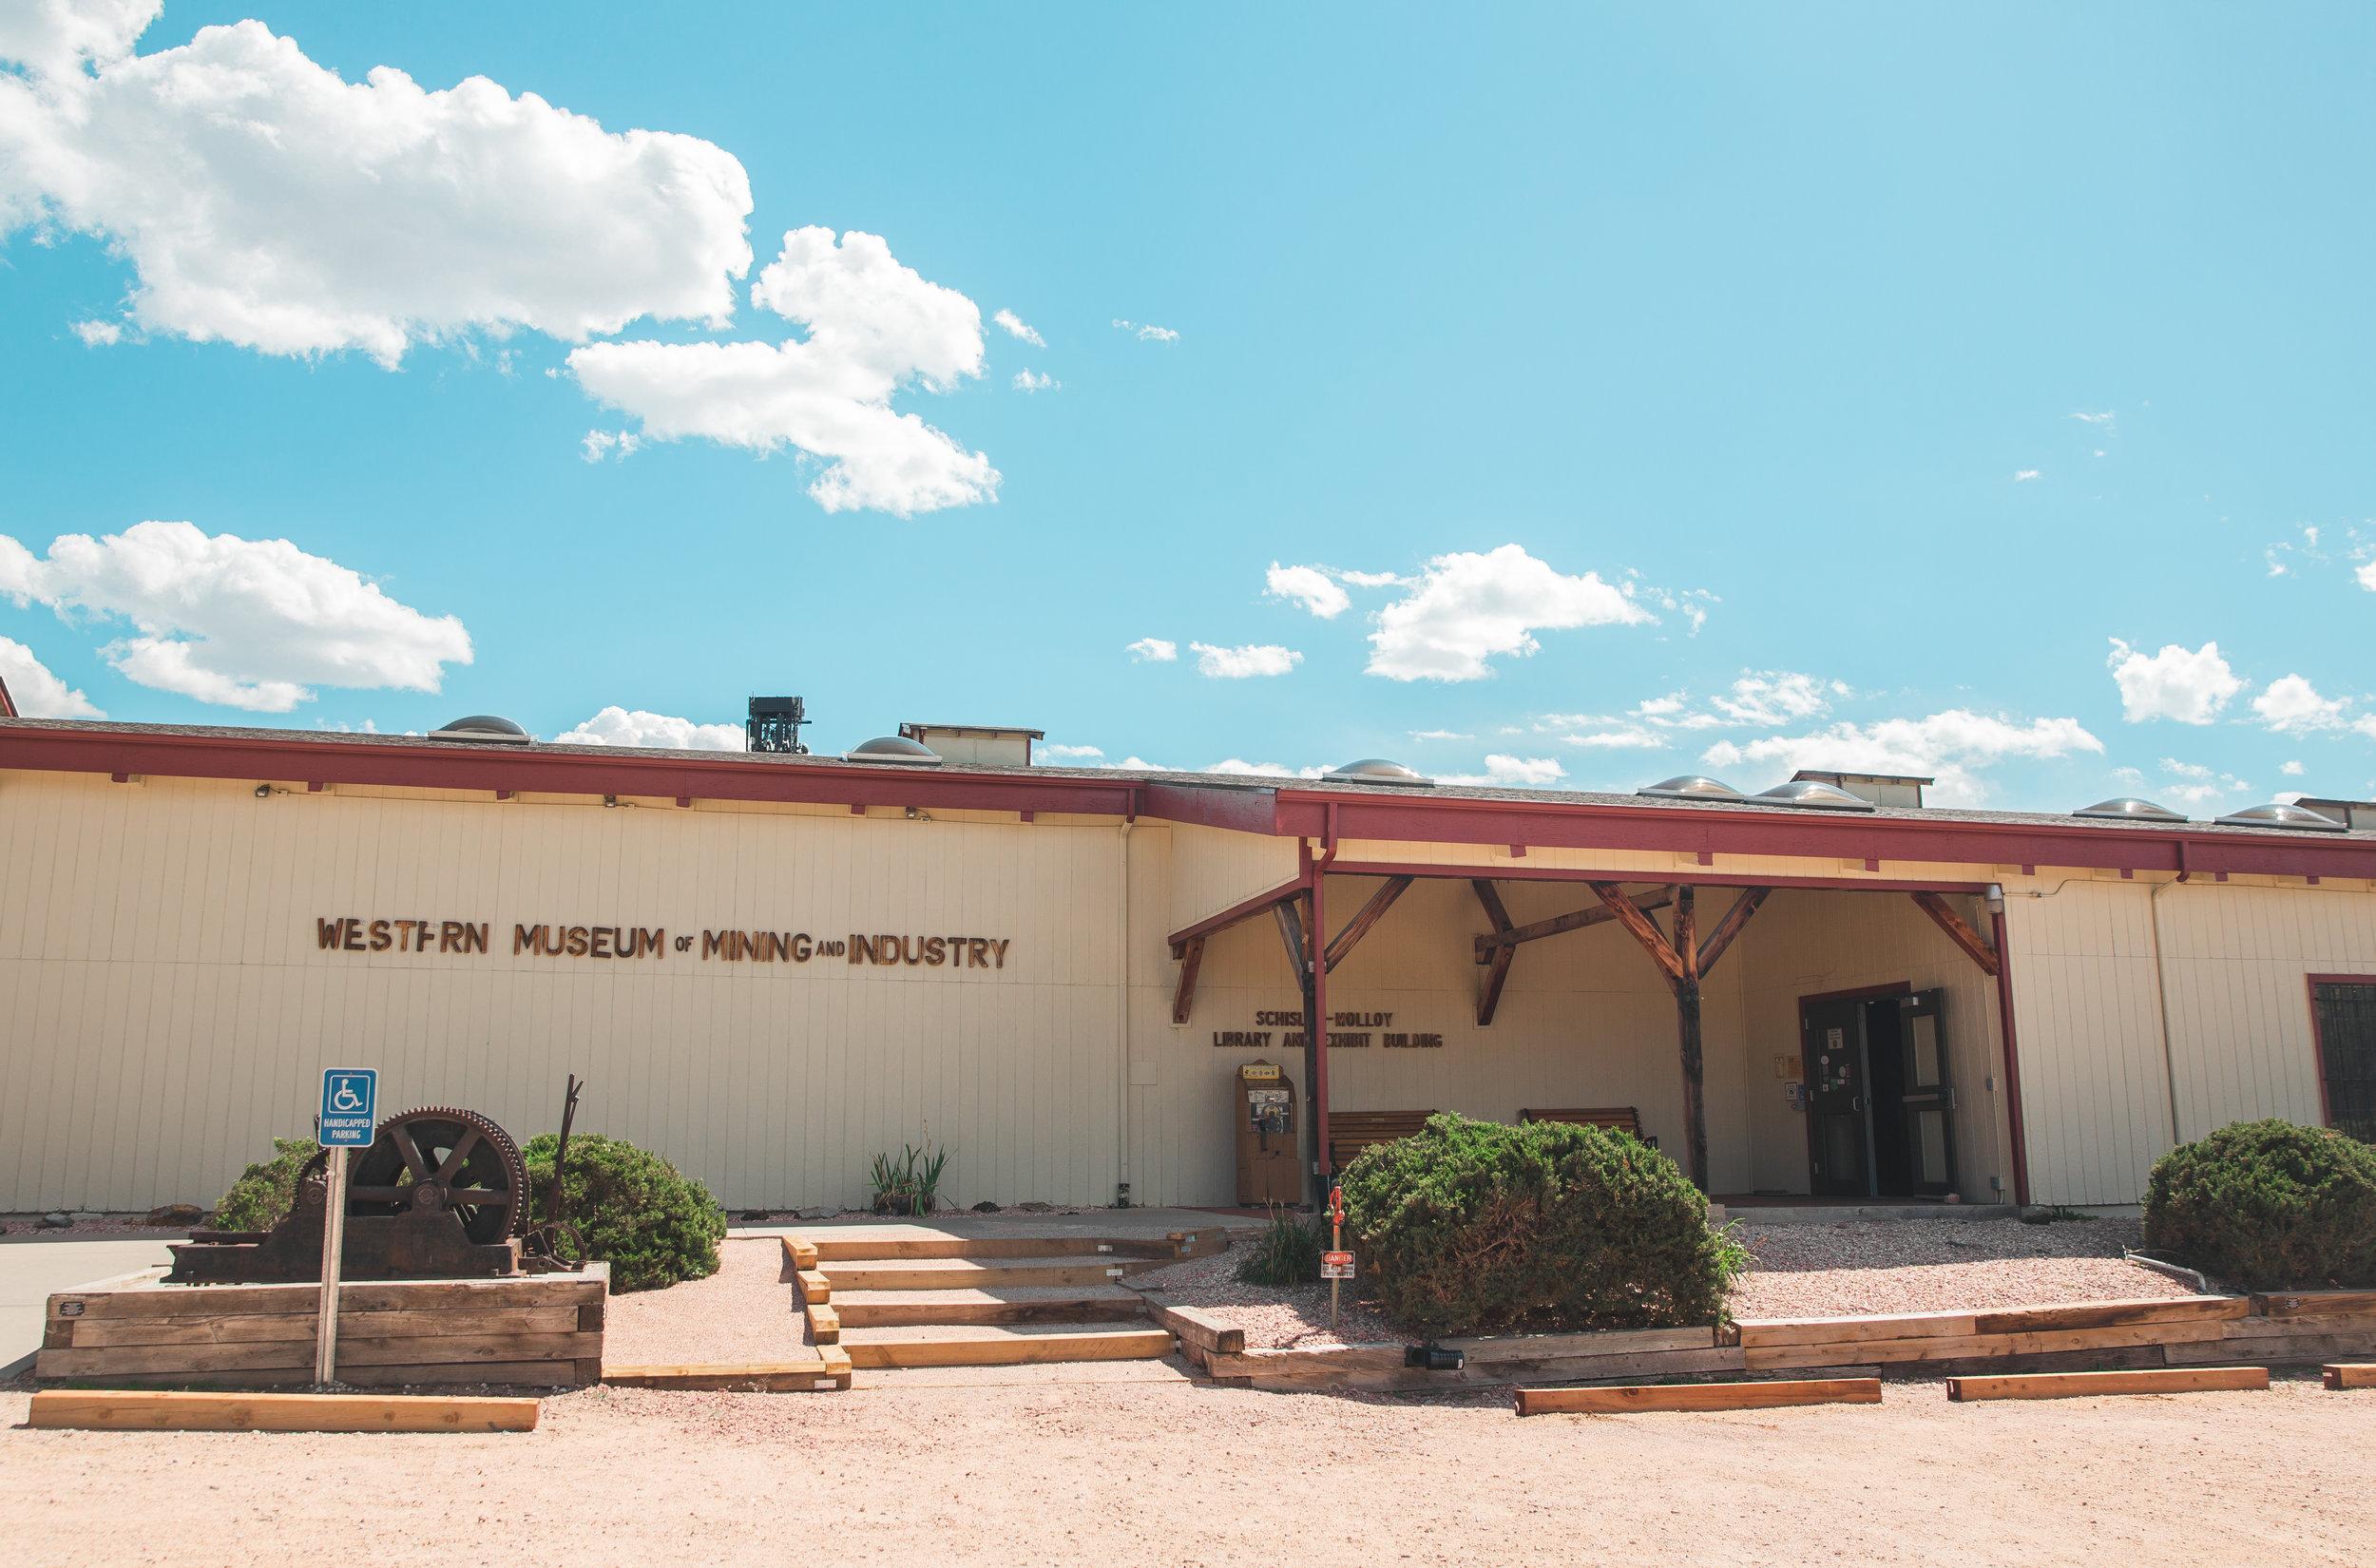 Western Museum of Mining & Industry